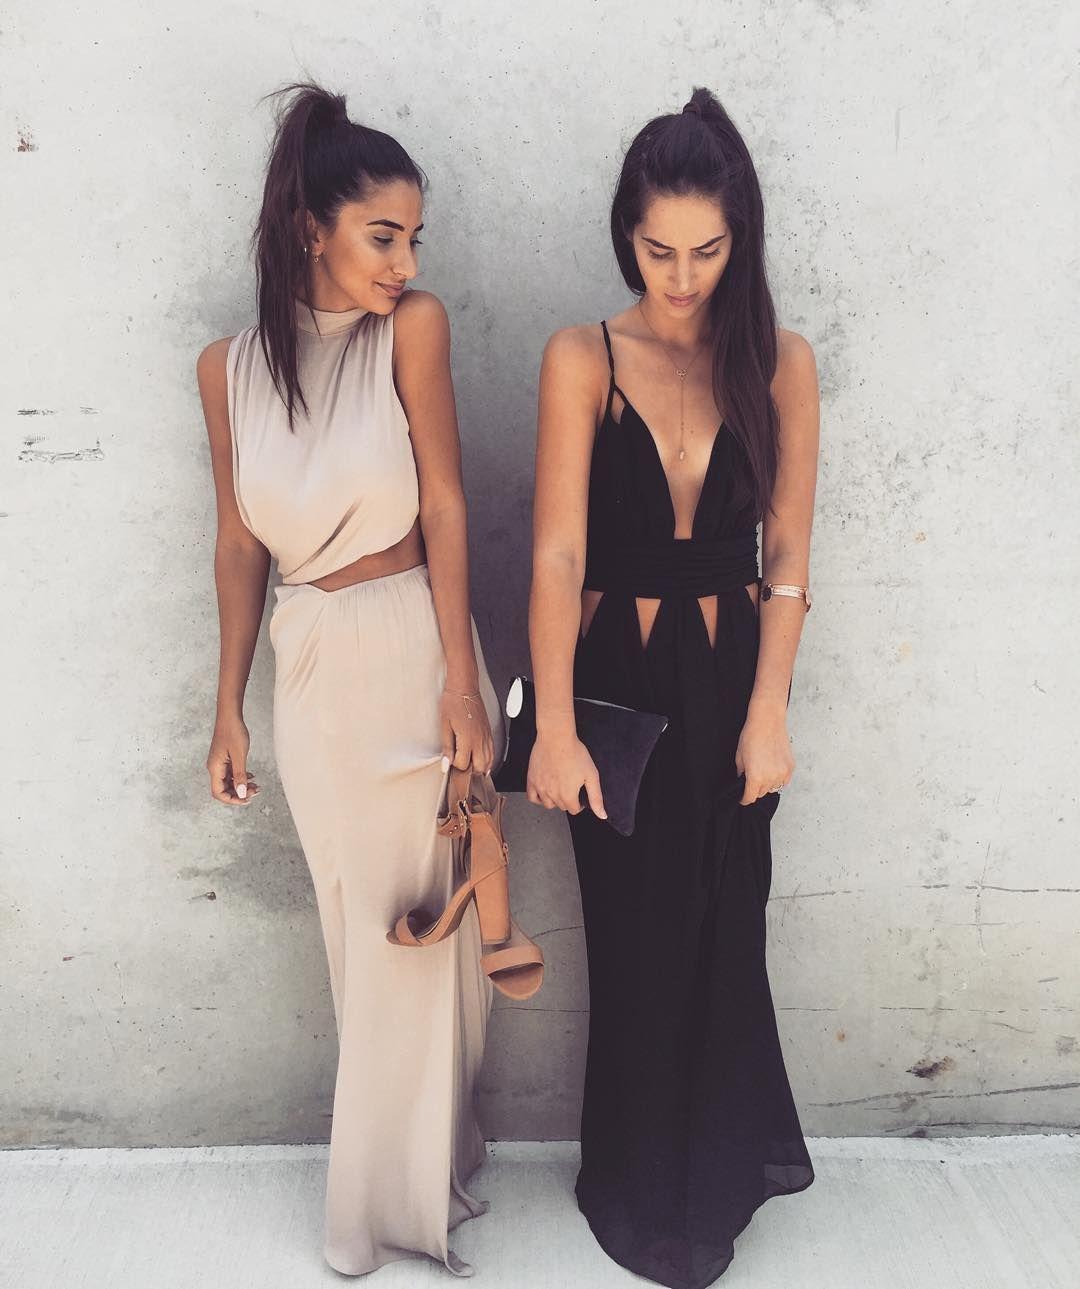 Black dress goals - Creme Drape Dress Serene Dress Saboskirt Saboformal Https Saboskirt